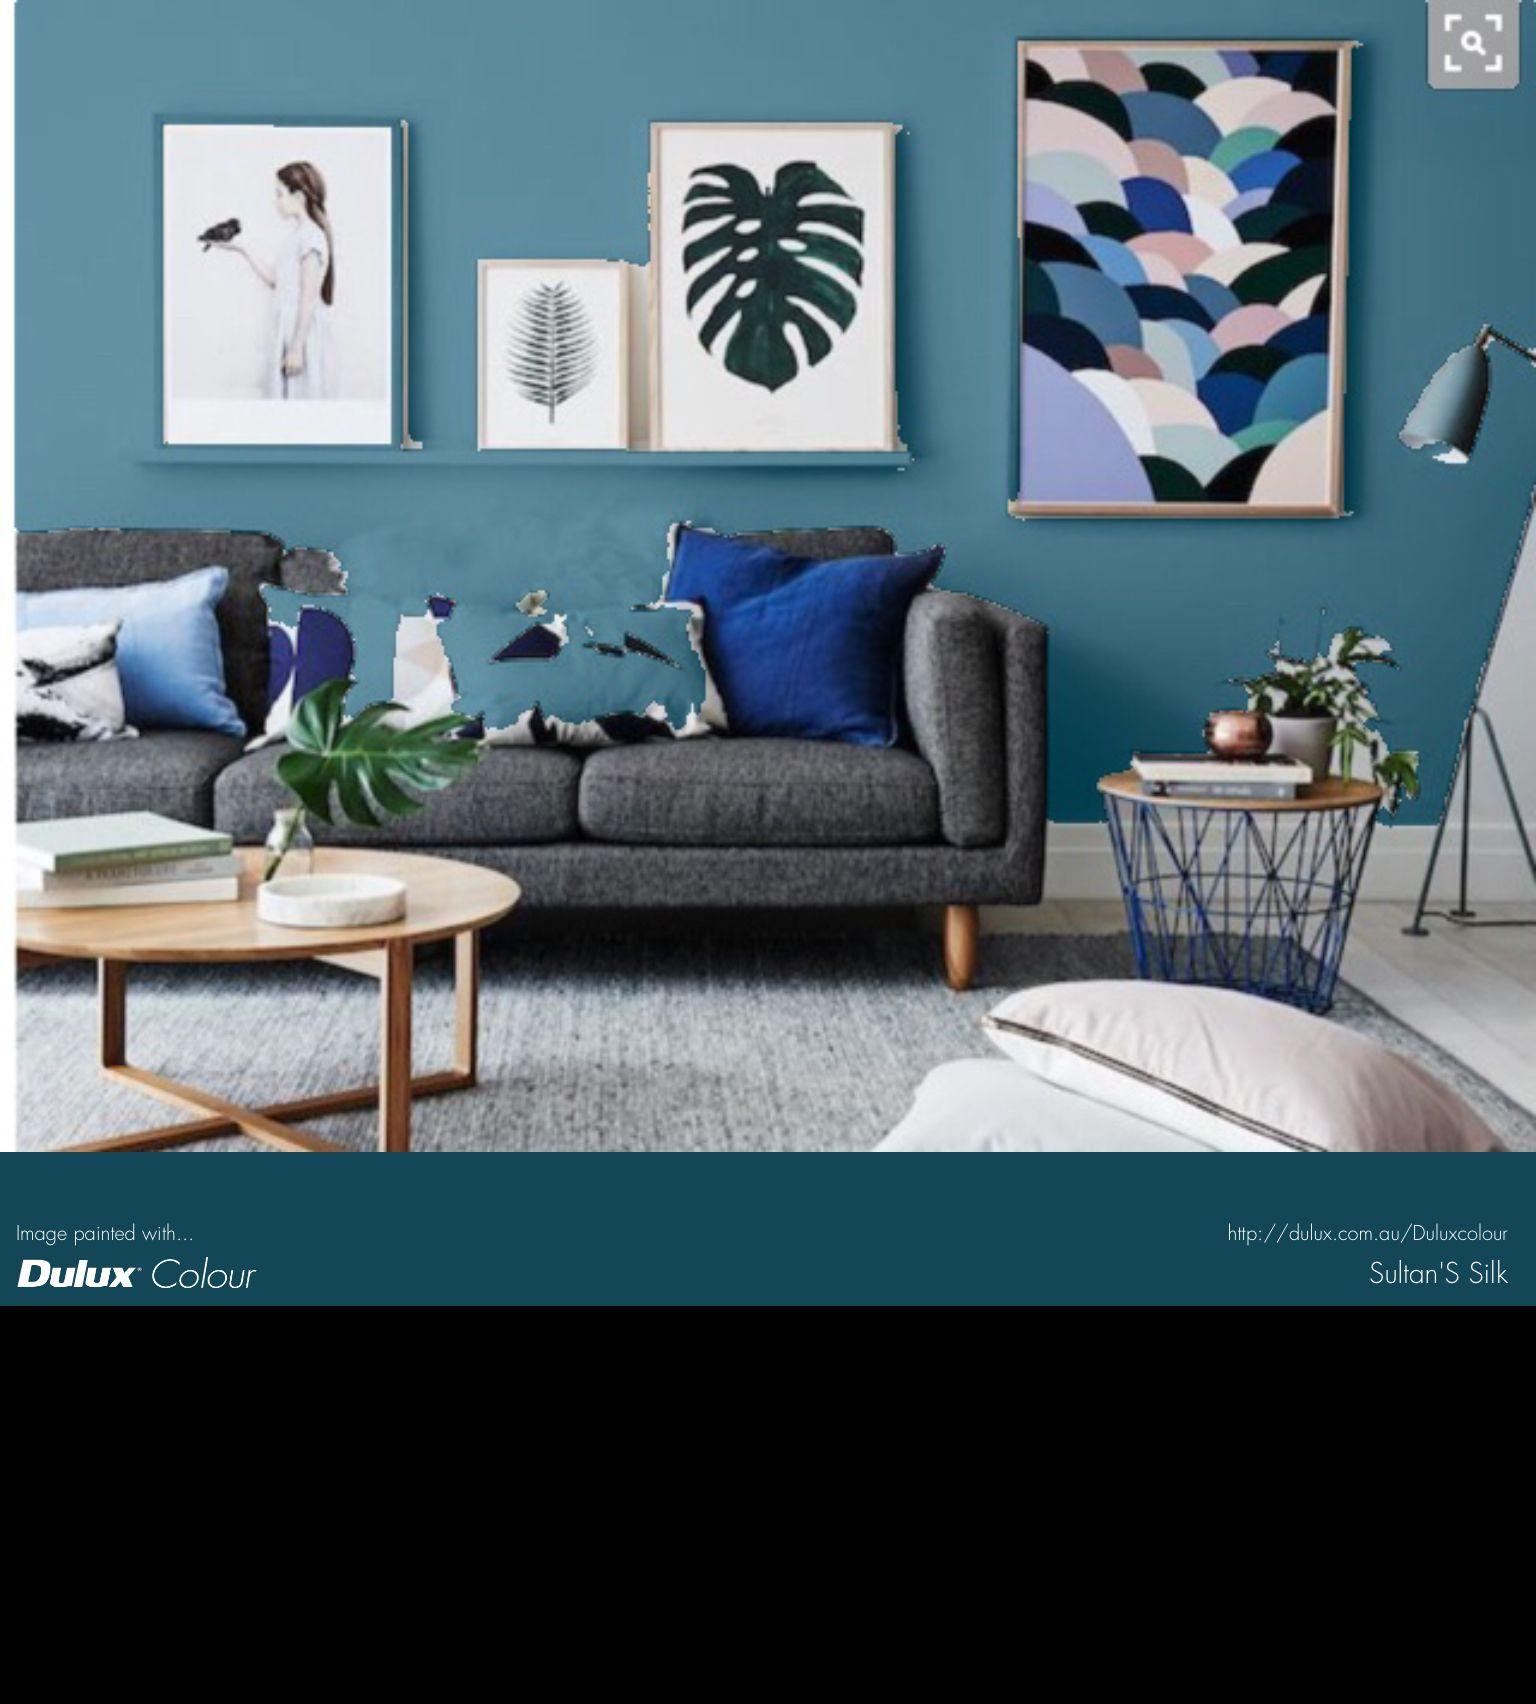 Connecting To The Itunes Store Dulux Colour Dulux Interior Color Schemes